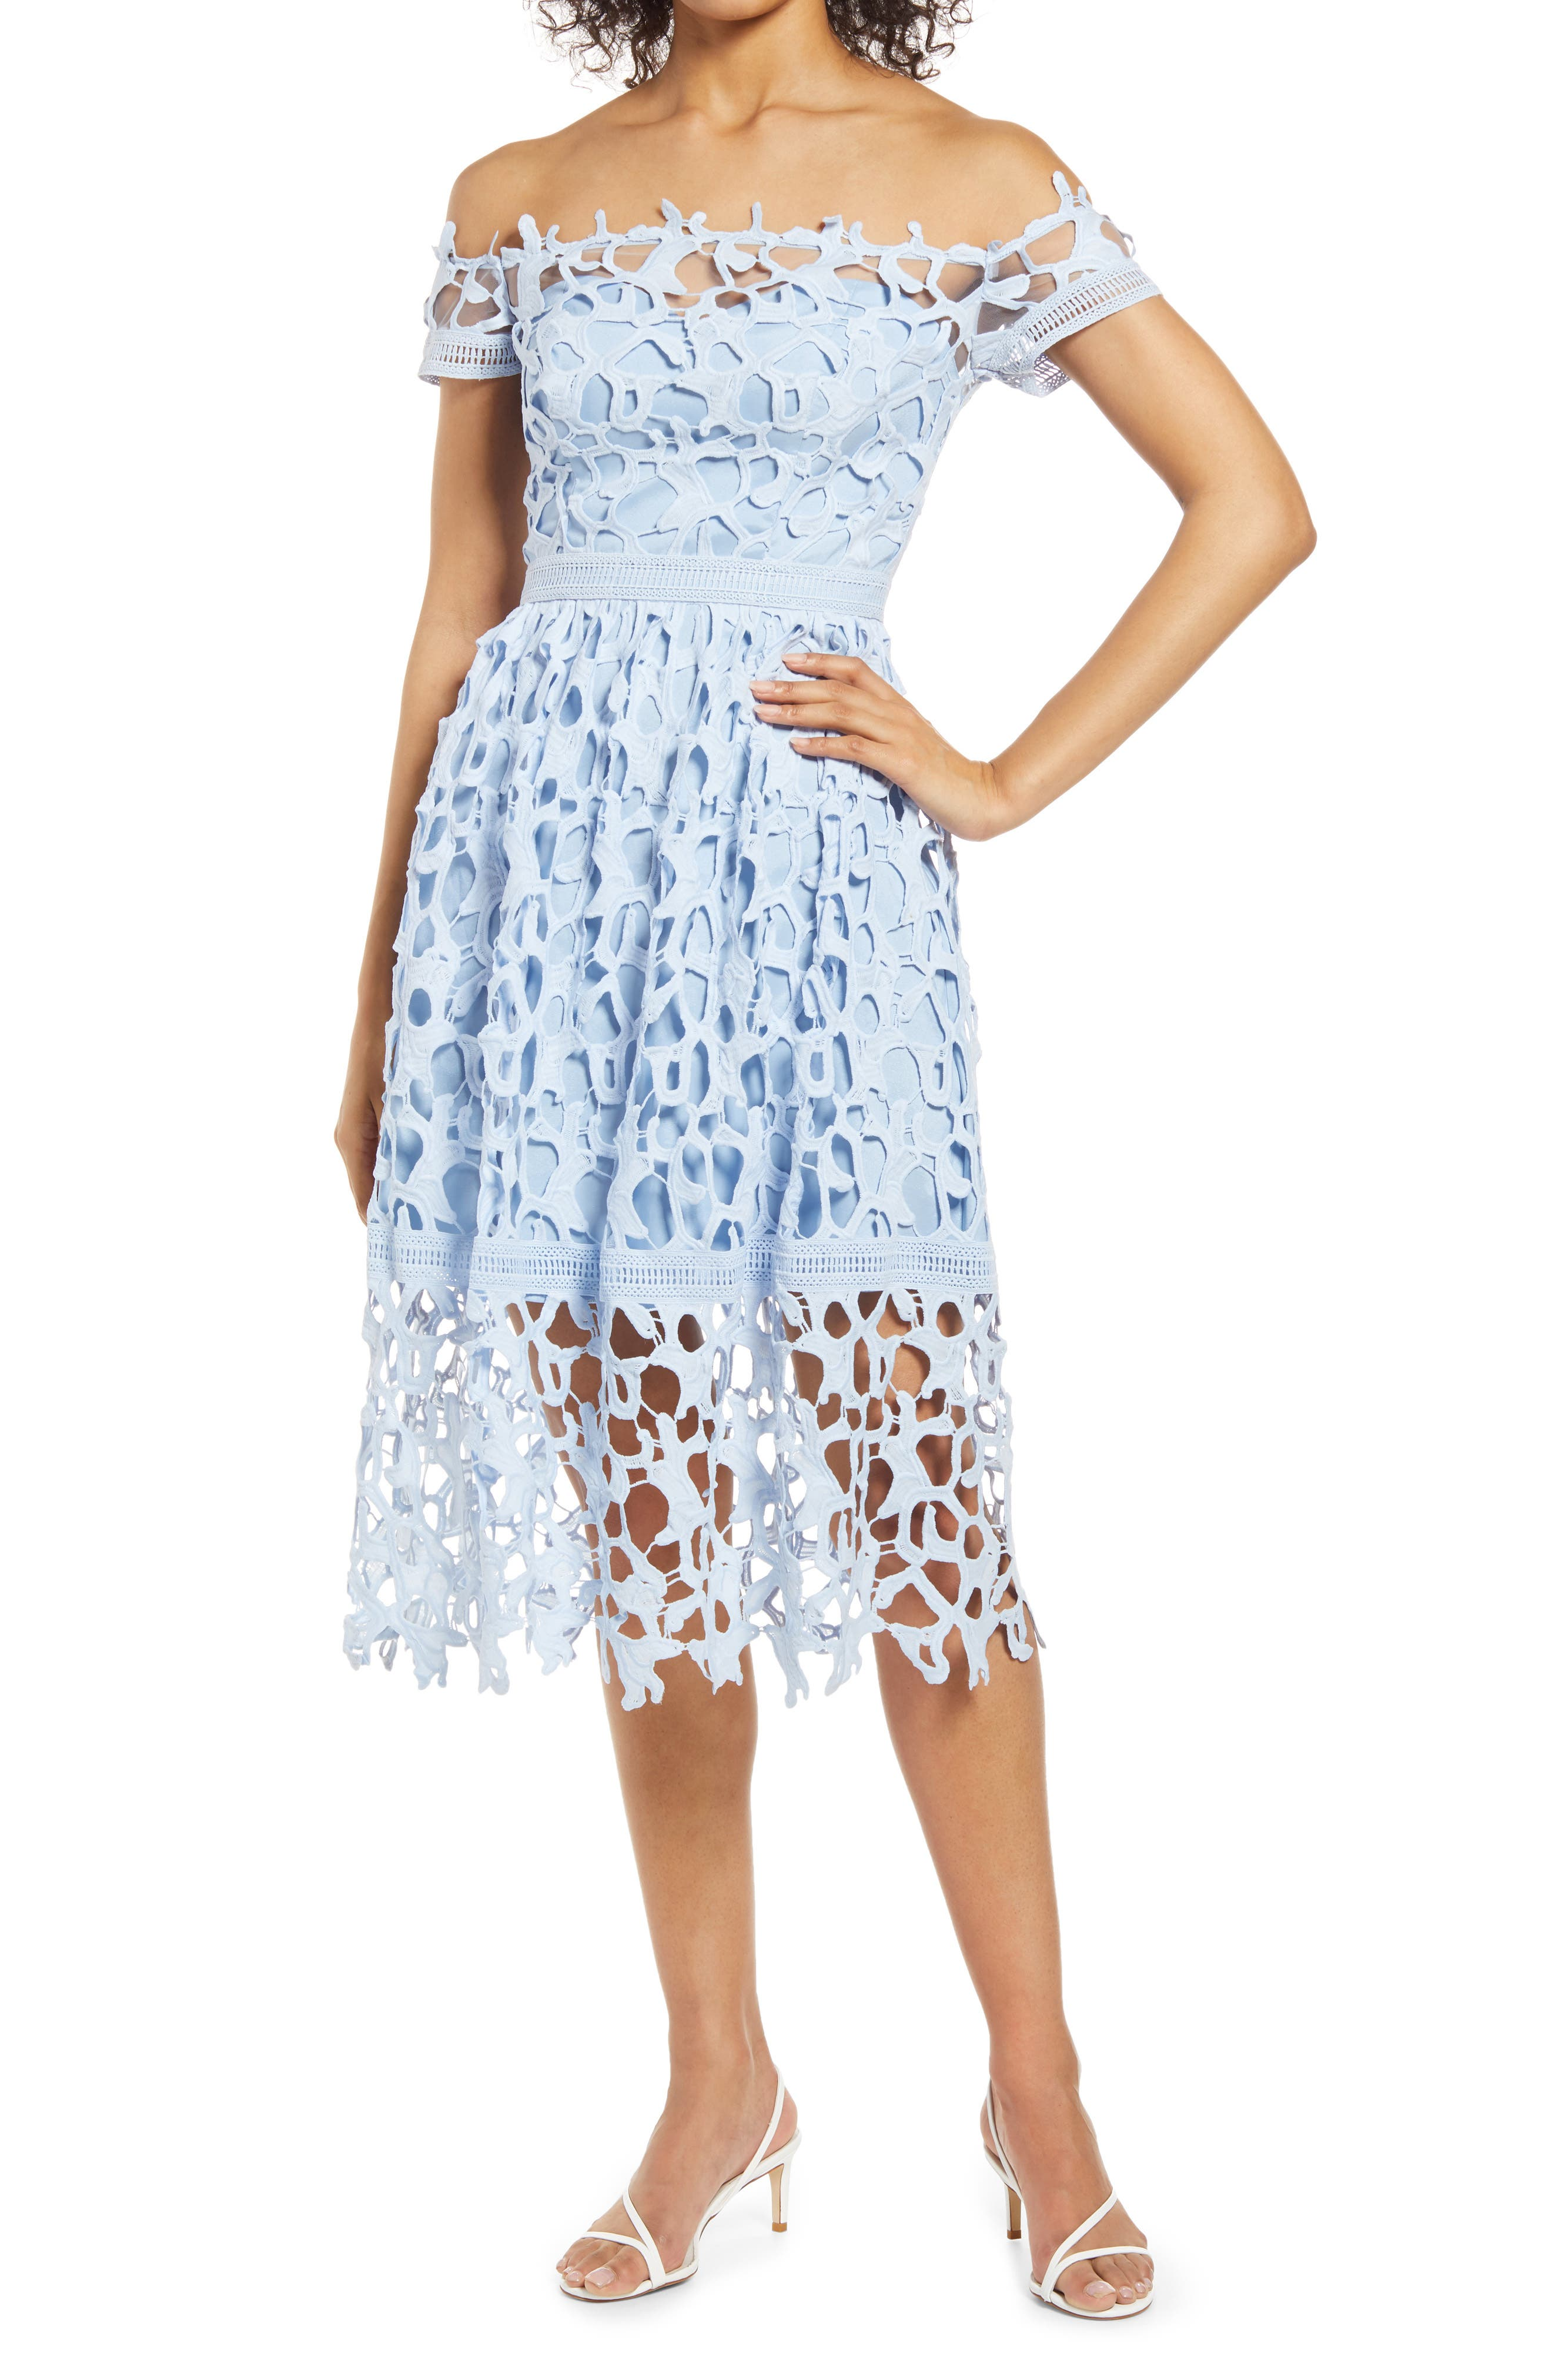 Bardot Off The Shoulder Lace A-Line Dress